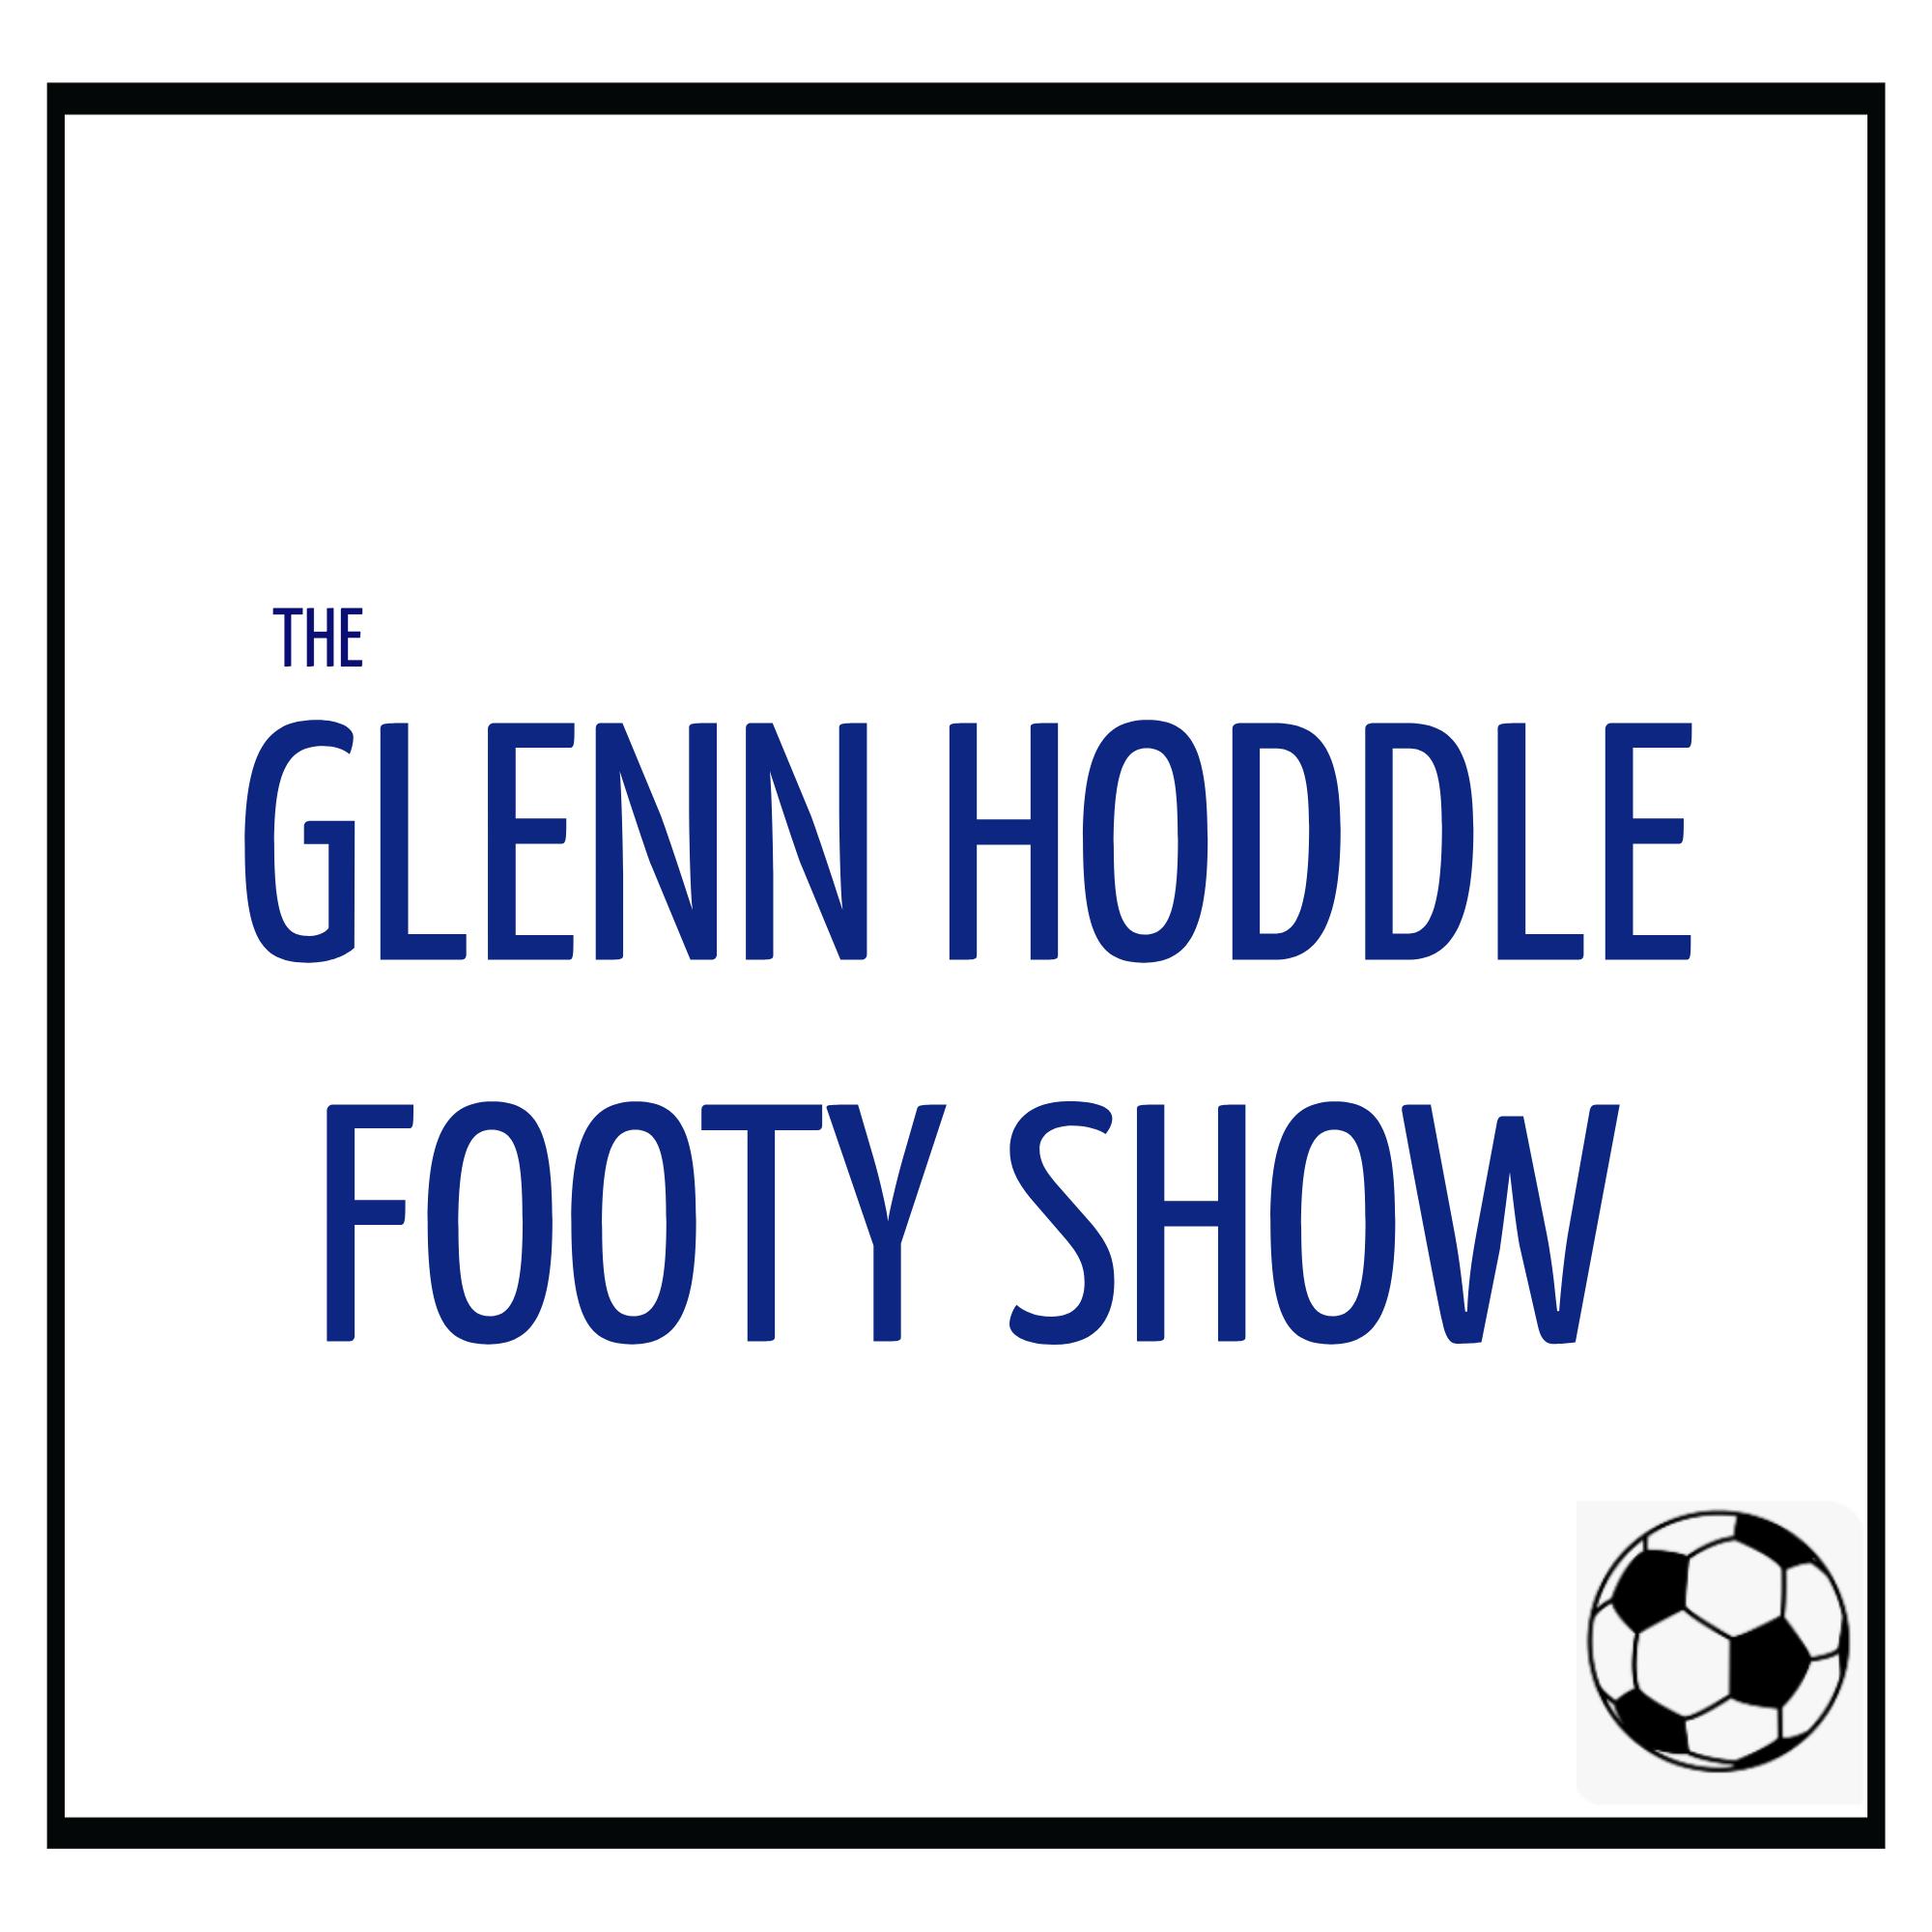 The Glenn Hoddle Footy Show show art